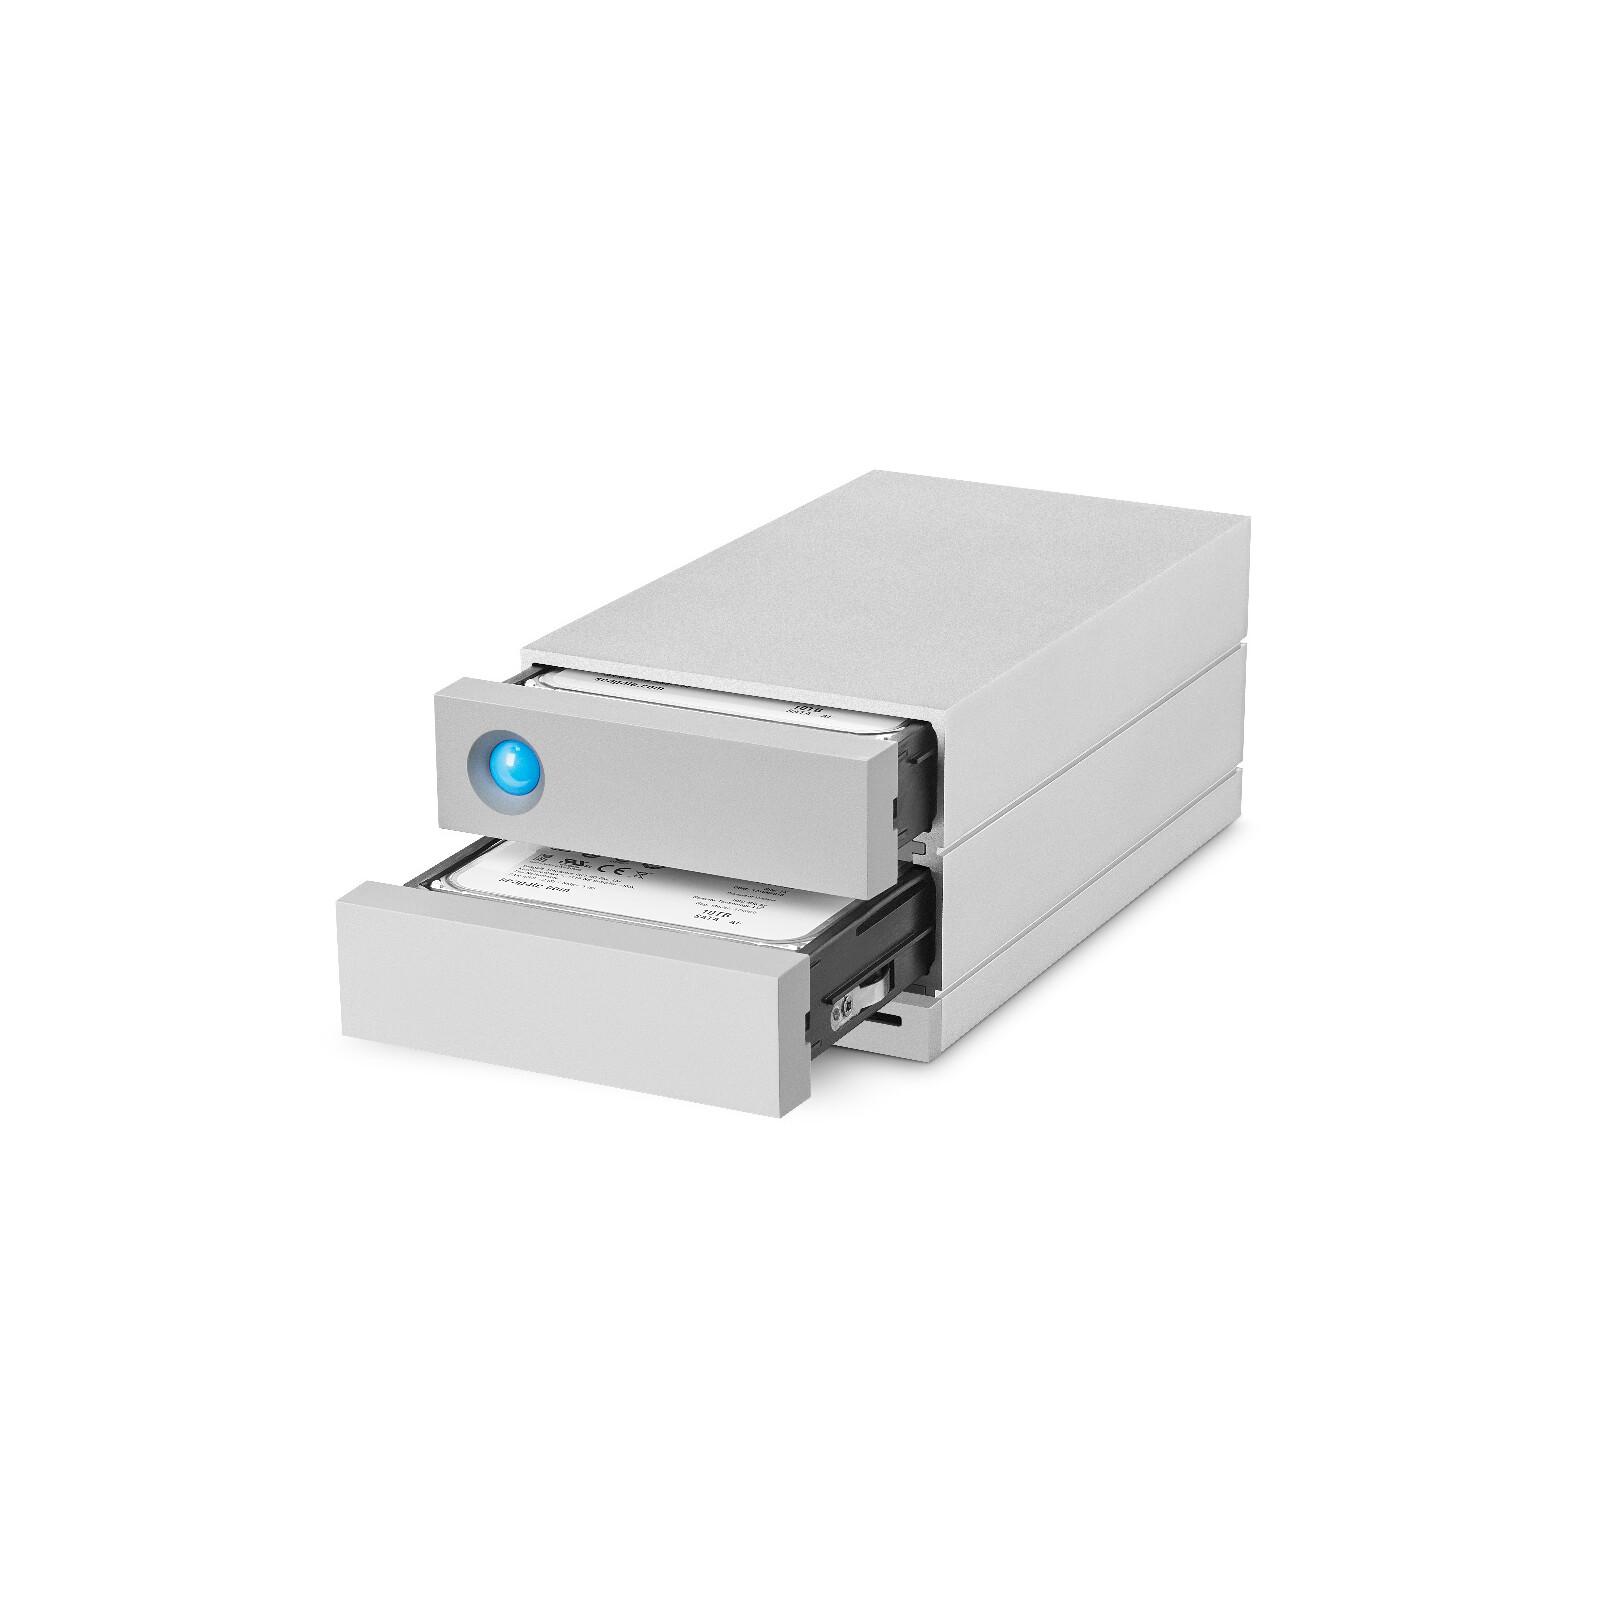 LaCie 2big Dock 16TB Thunderbolt 3, DAS